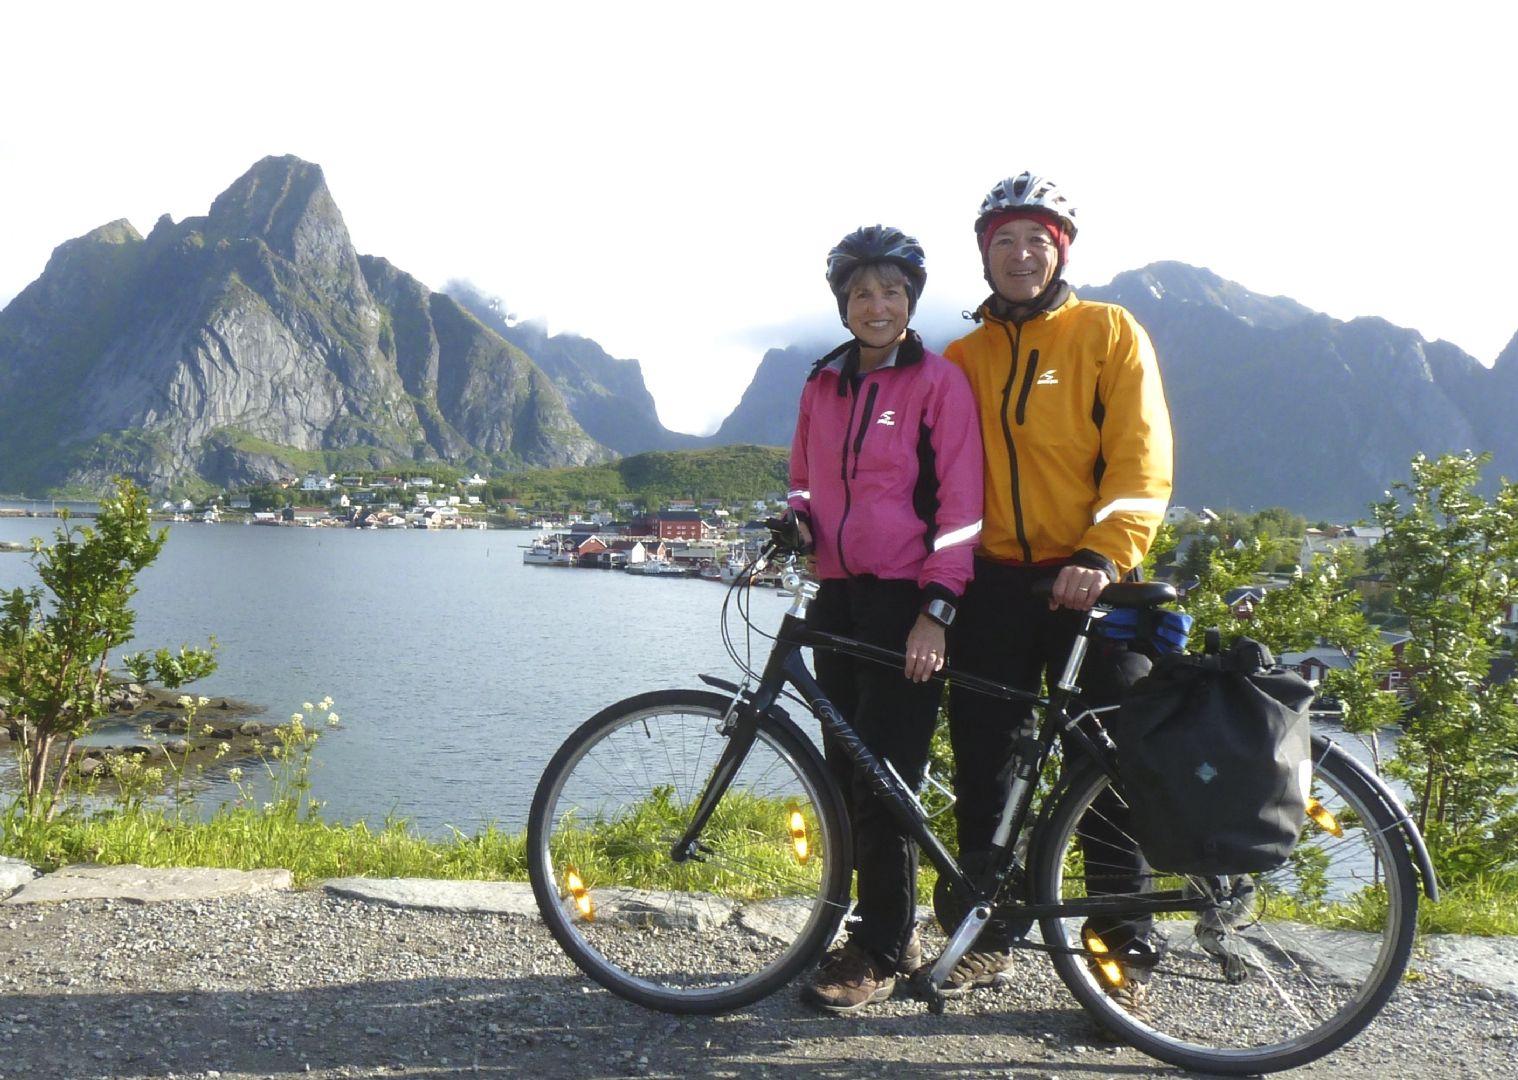 _Customer.103820.17300.jpg - Norway - Lofoten Islands - Self-Guided Leisure Cycling Holiday - Leisure Cycling